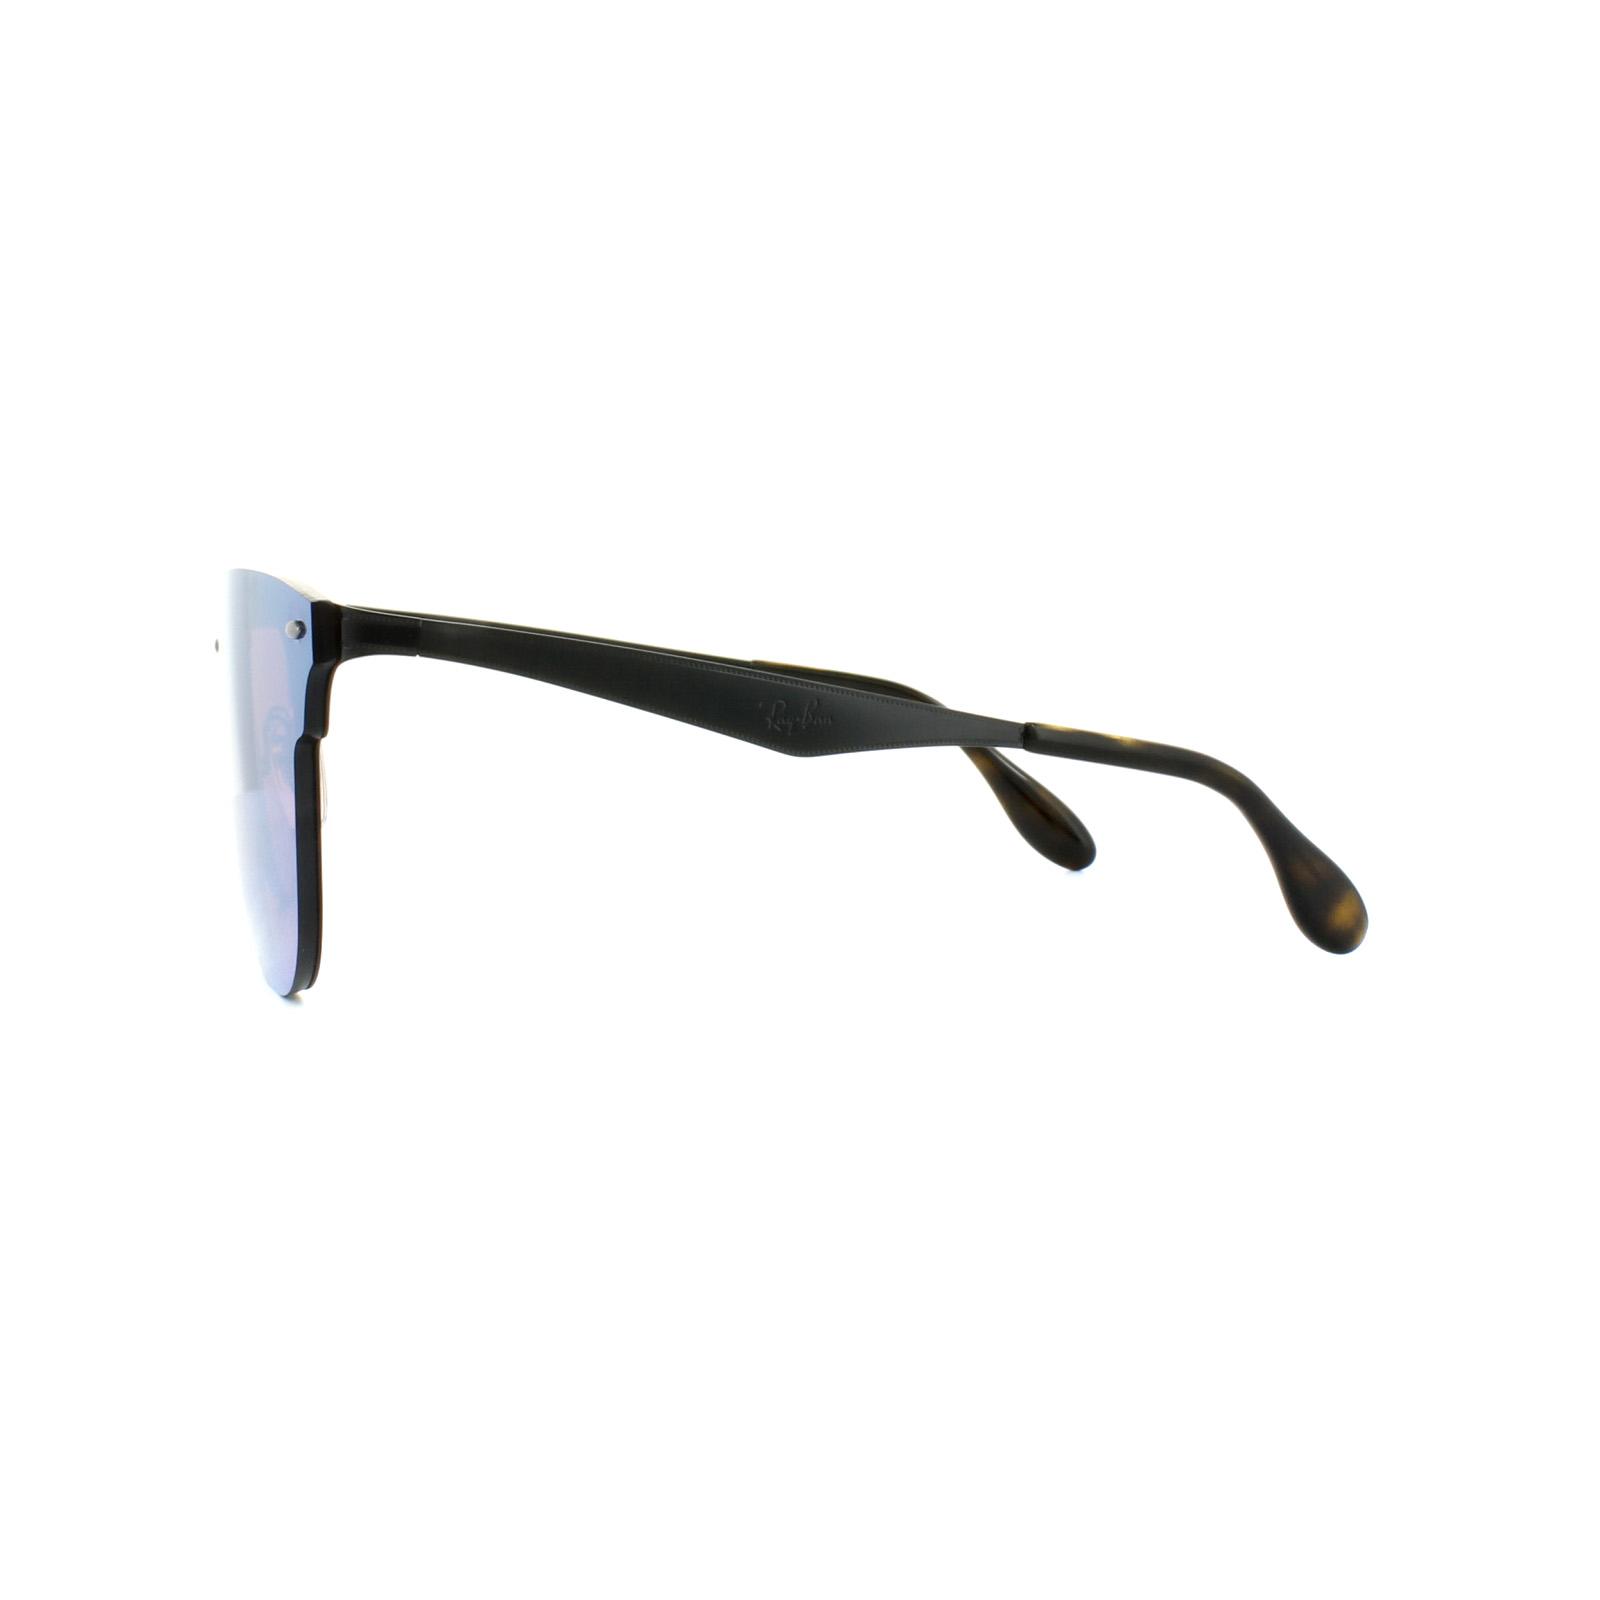 cd060fd44c777 CENTINELA Gafas de sol Ray-Ban Clubmaster 3576N de Blaze 153 7V negro  espejo azul